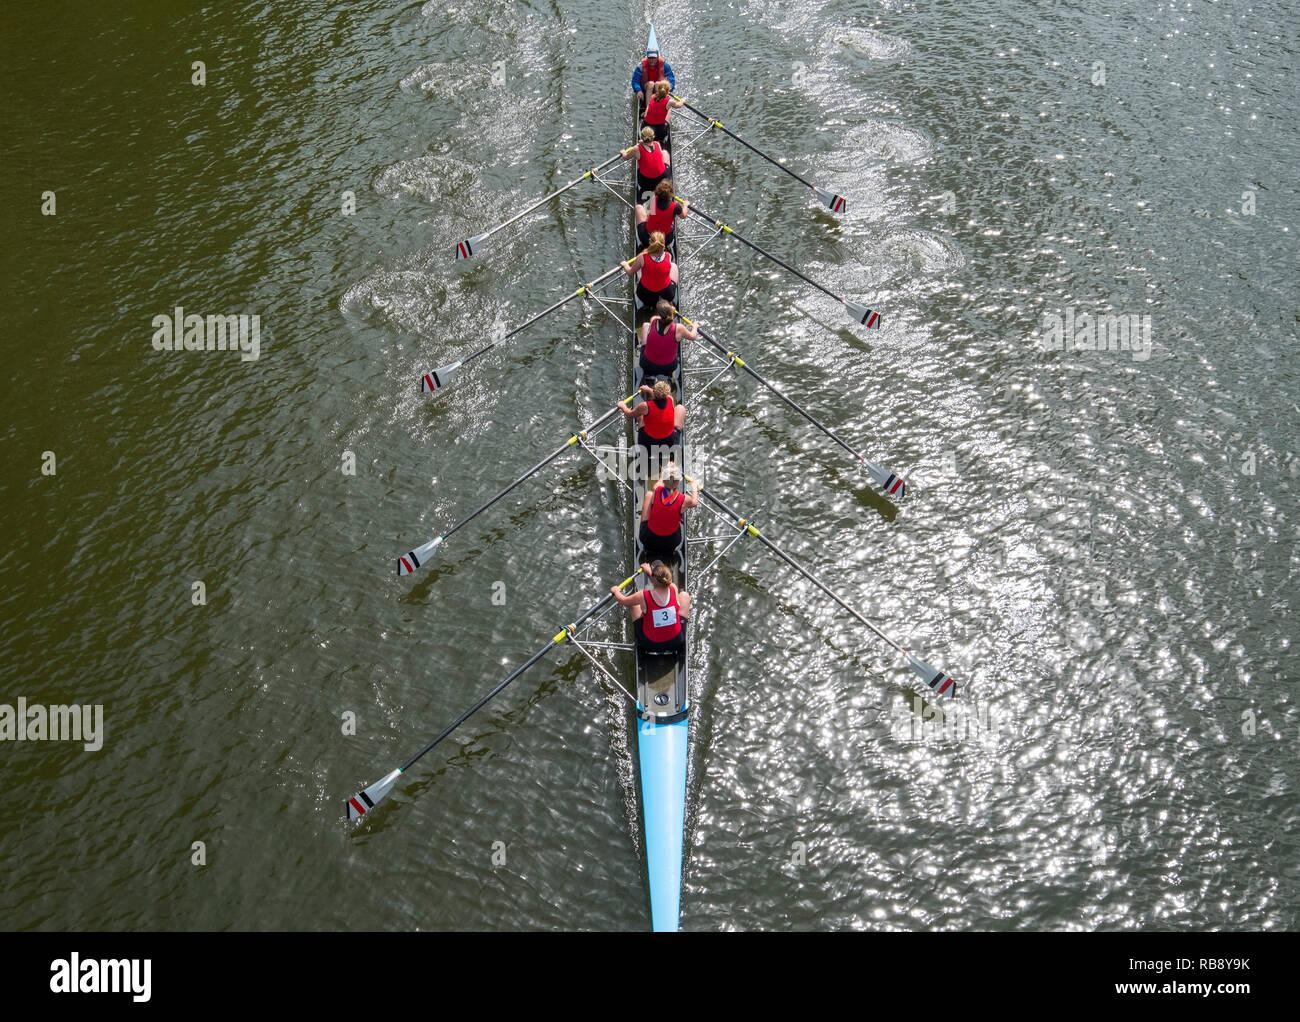 A rowing crew competing at Shrewsbury Regatta passing under Kingsland Bridge on the River Severn, Shropshire, England, UK - Stock Image